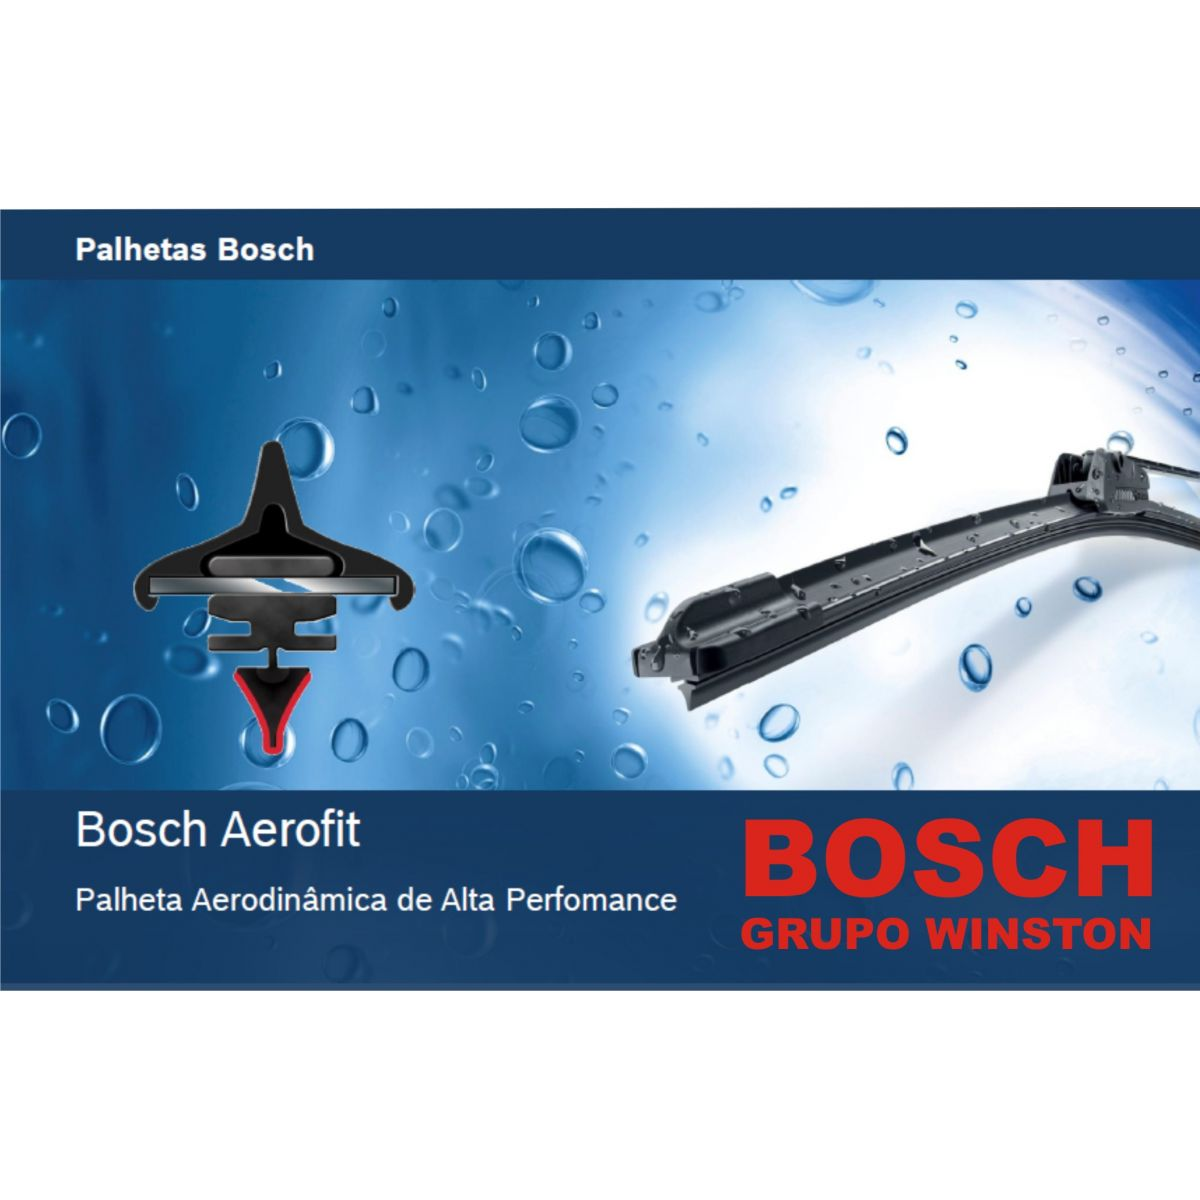 Palheta Bosch Aerofit Limpador de para brisa Bosch NISSAN Maxima